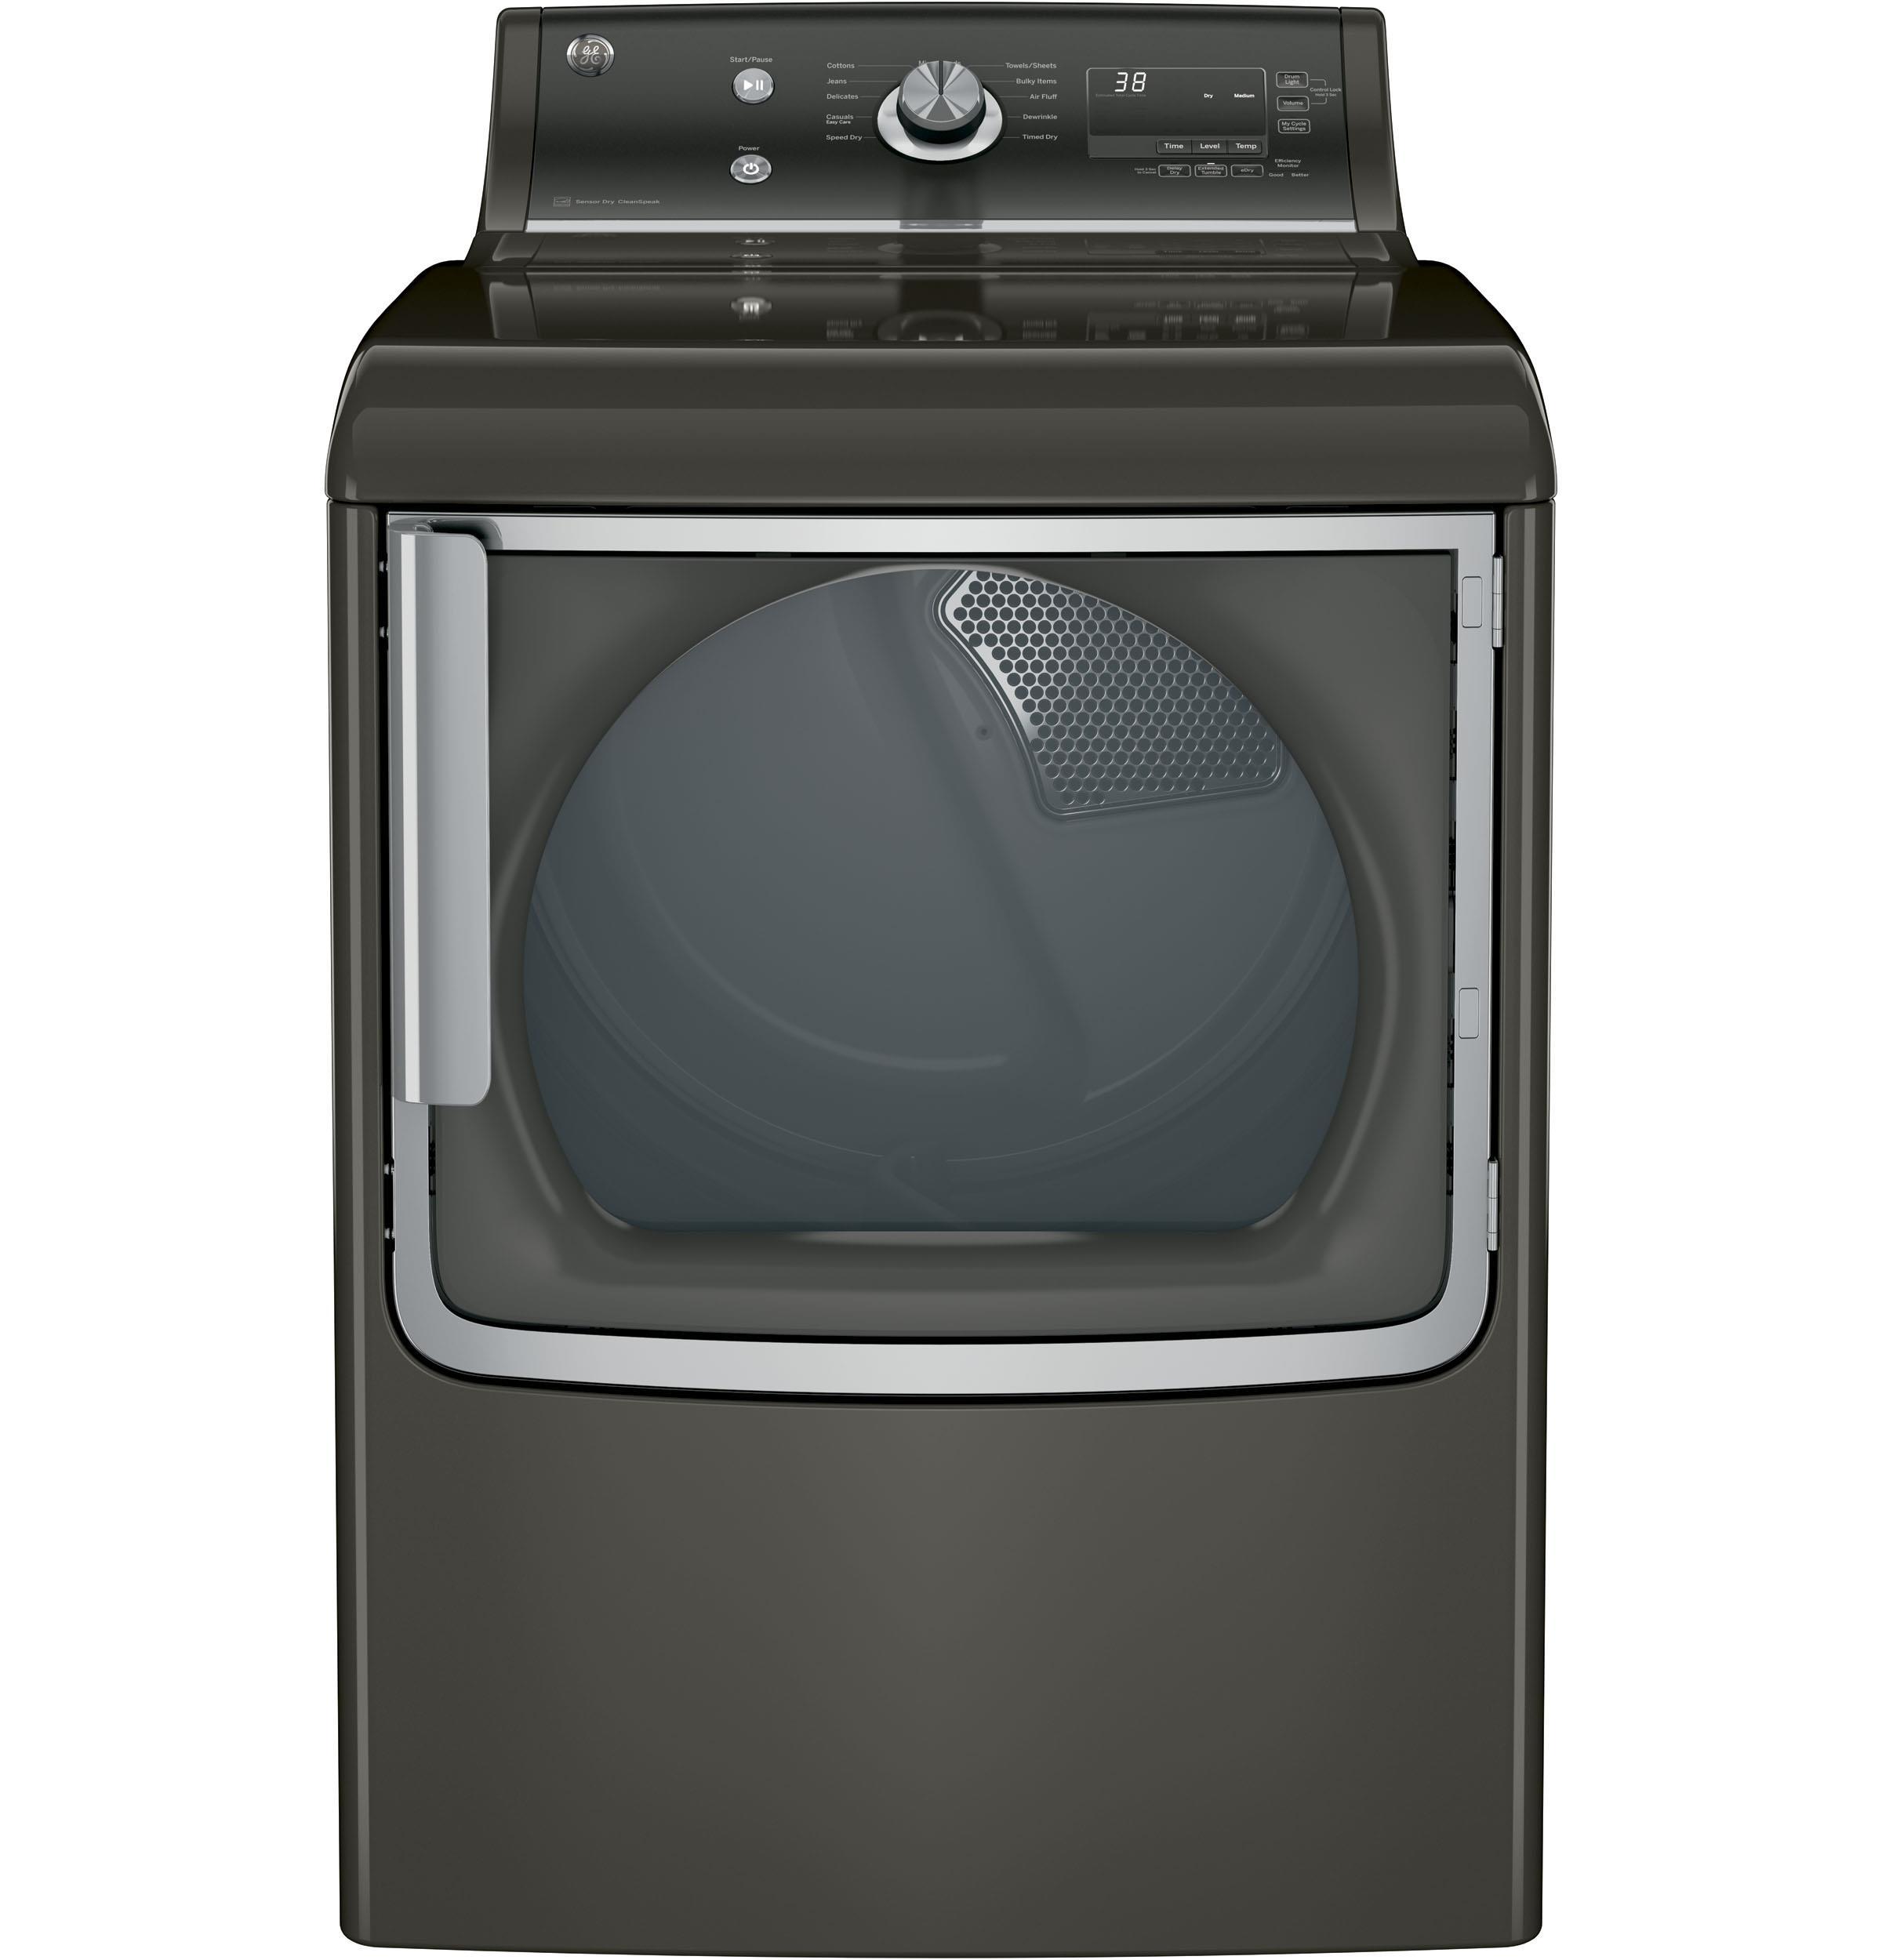 Appliances Dryers Ge Appliances 78 Cu Ft Capacity Electric Dryer Vandrie Home